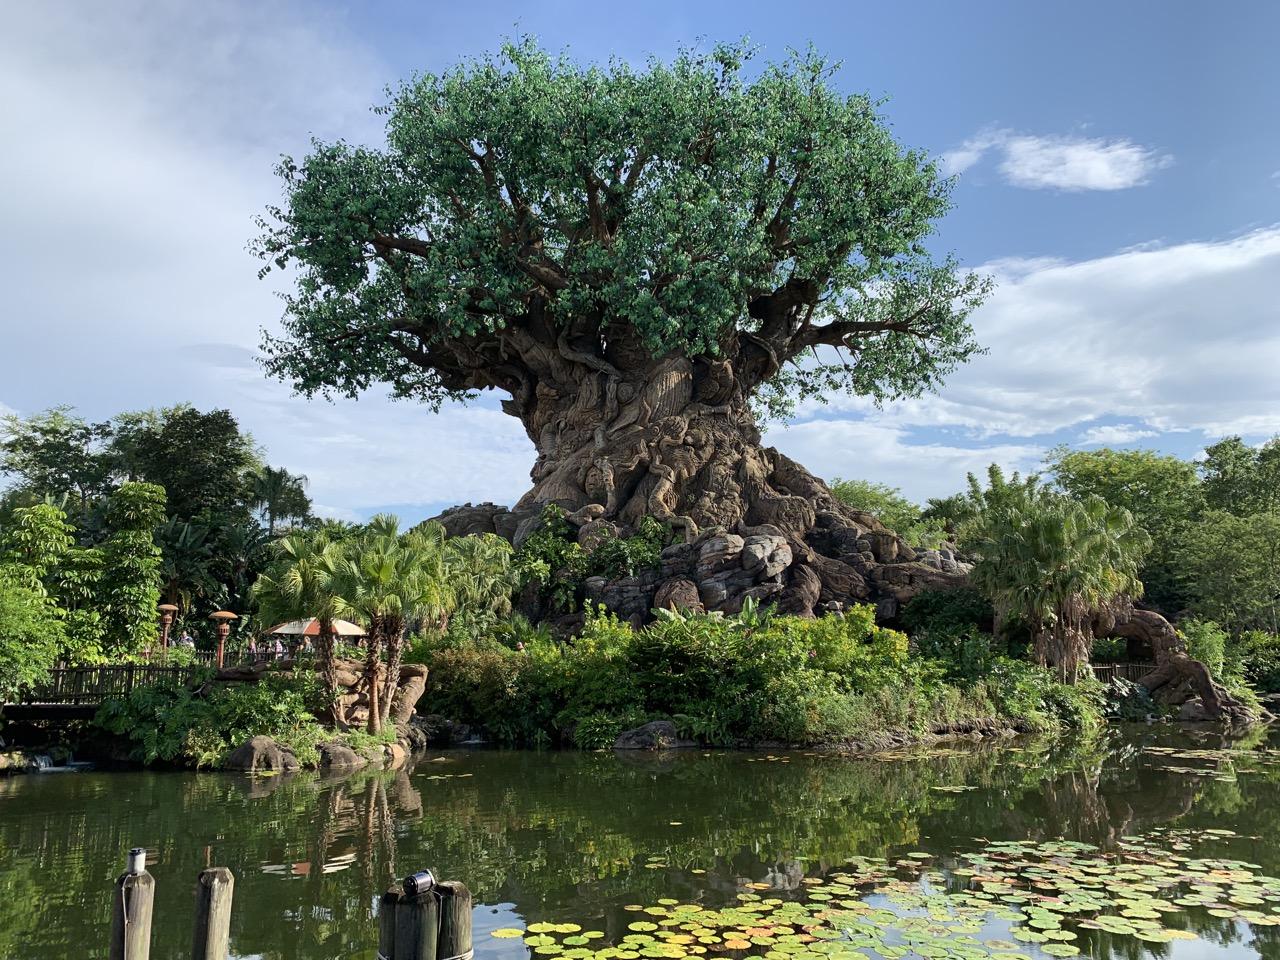 disney world trip report early summer 2019 day 1 11 tree.jpeg